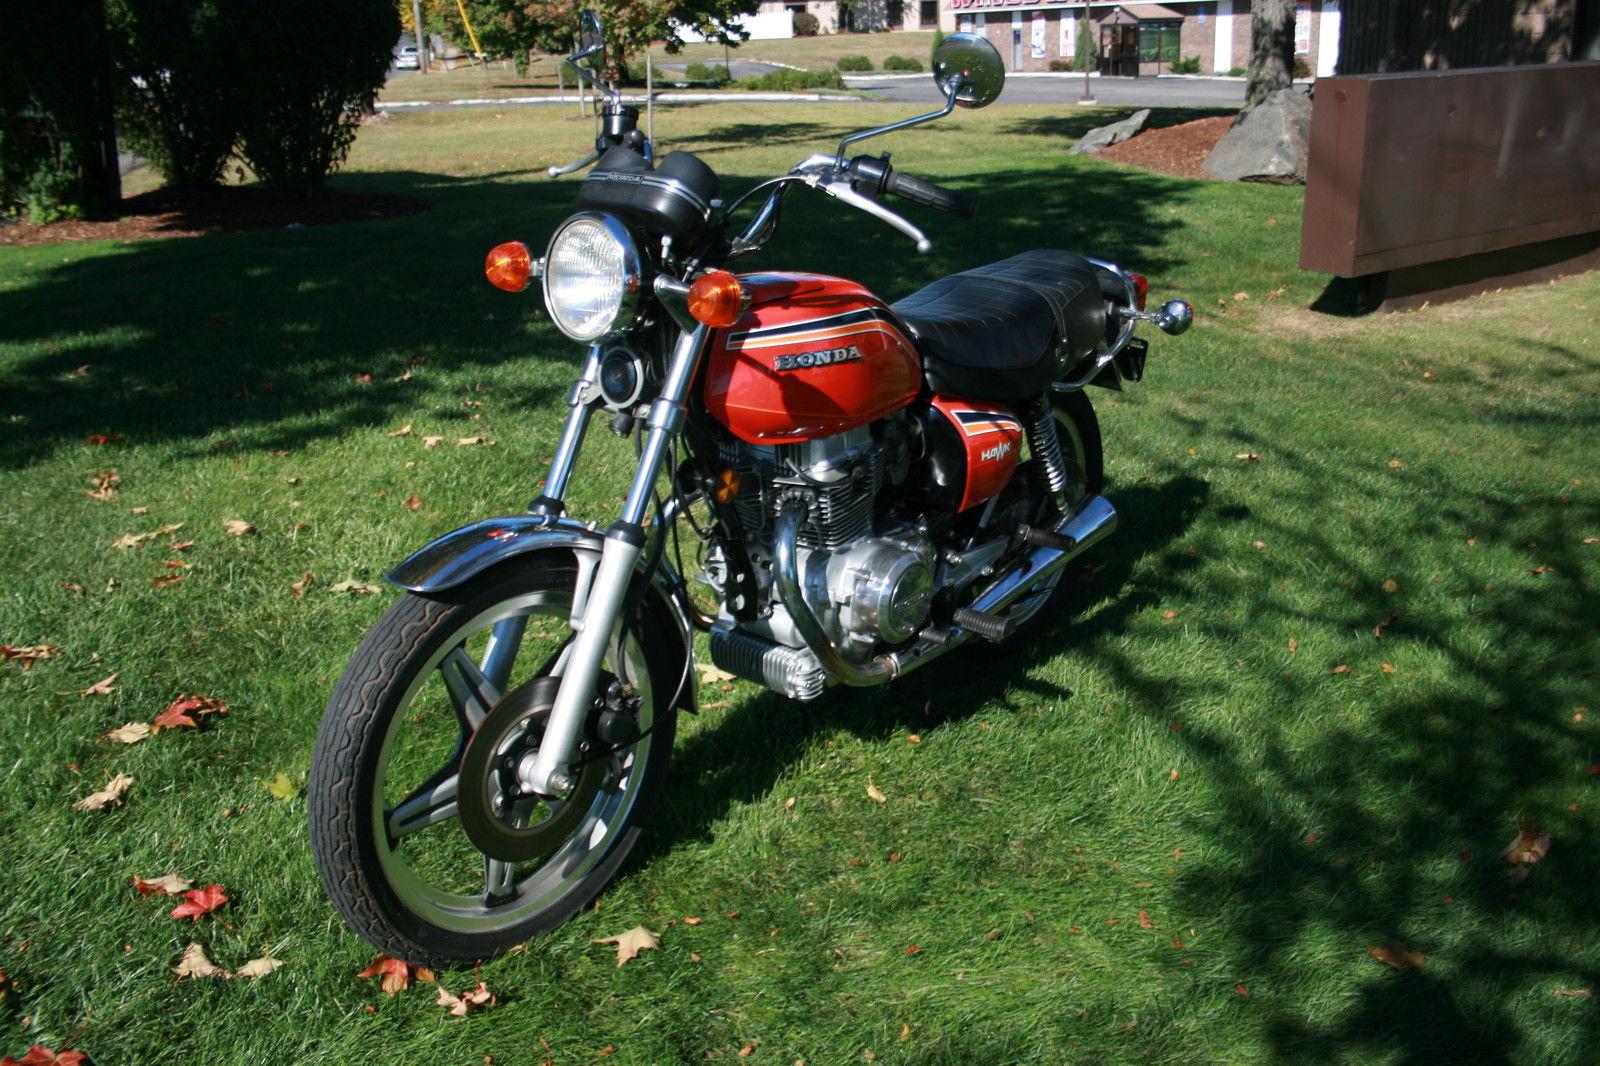 78 HONDA 400 HAWK---------- WINTER SPECIAL